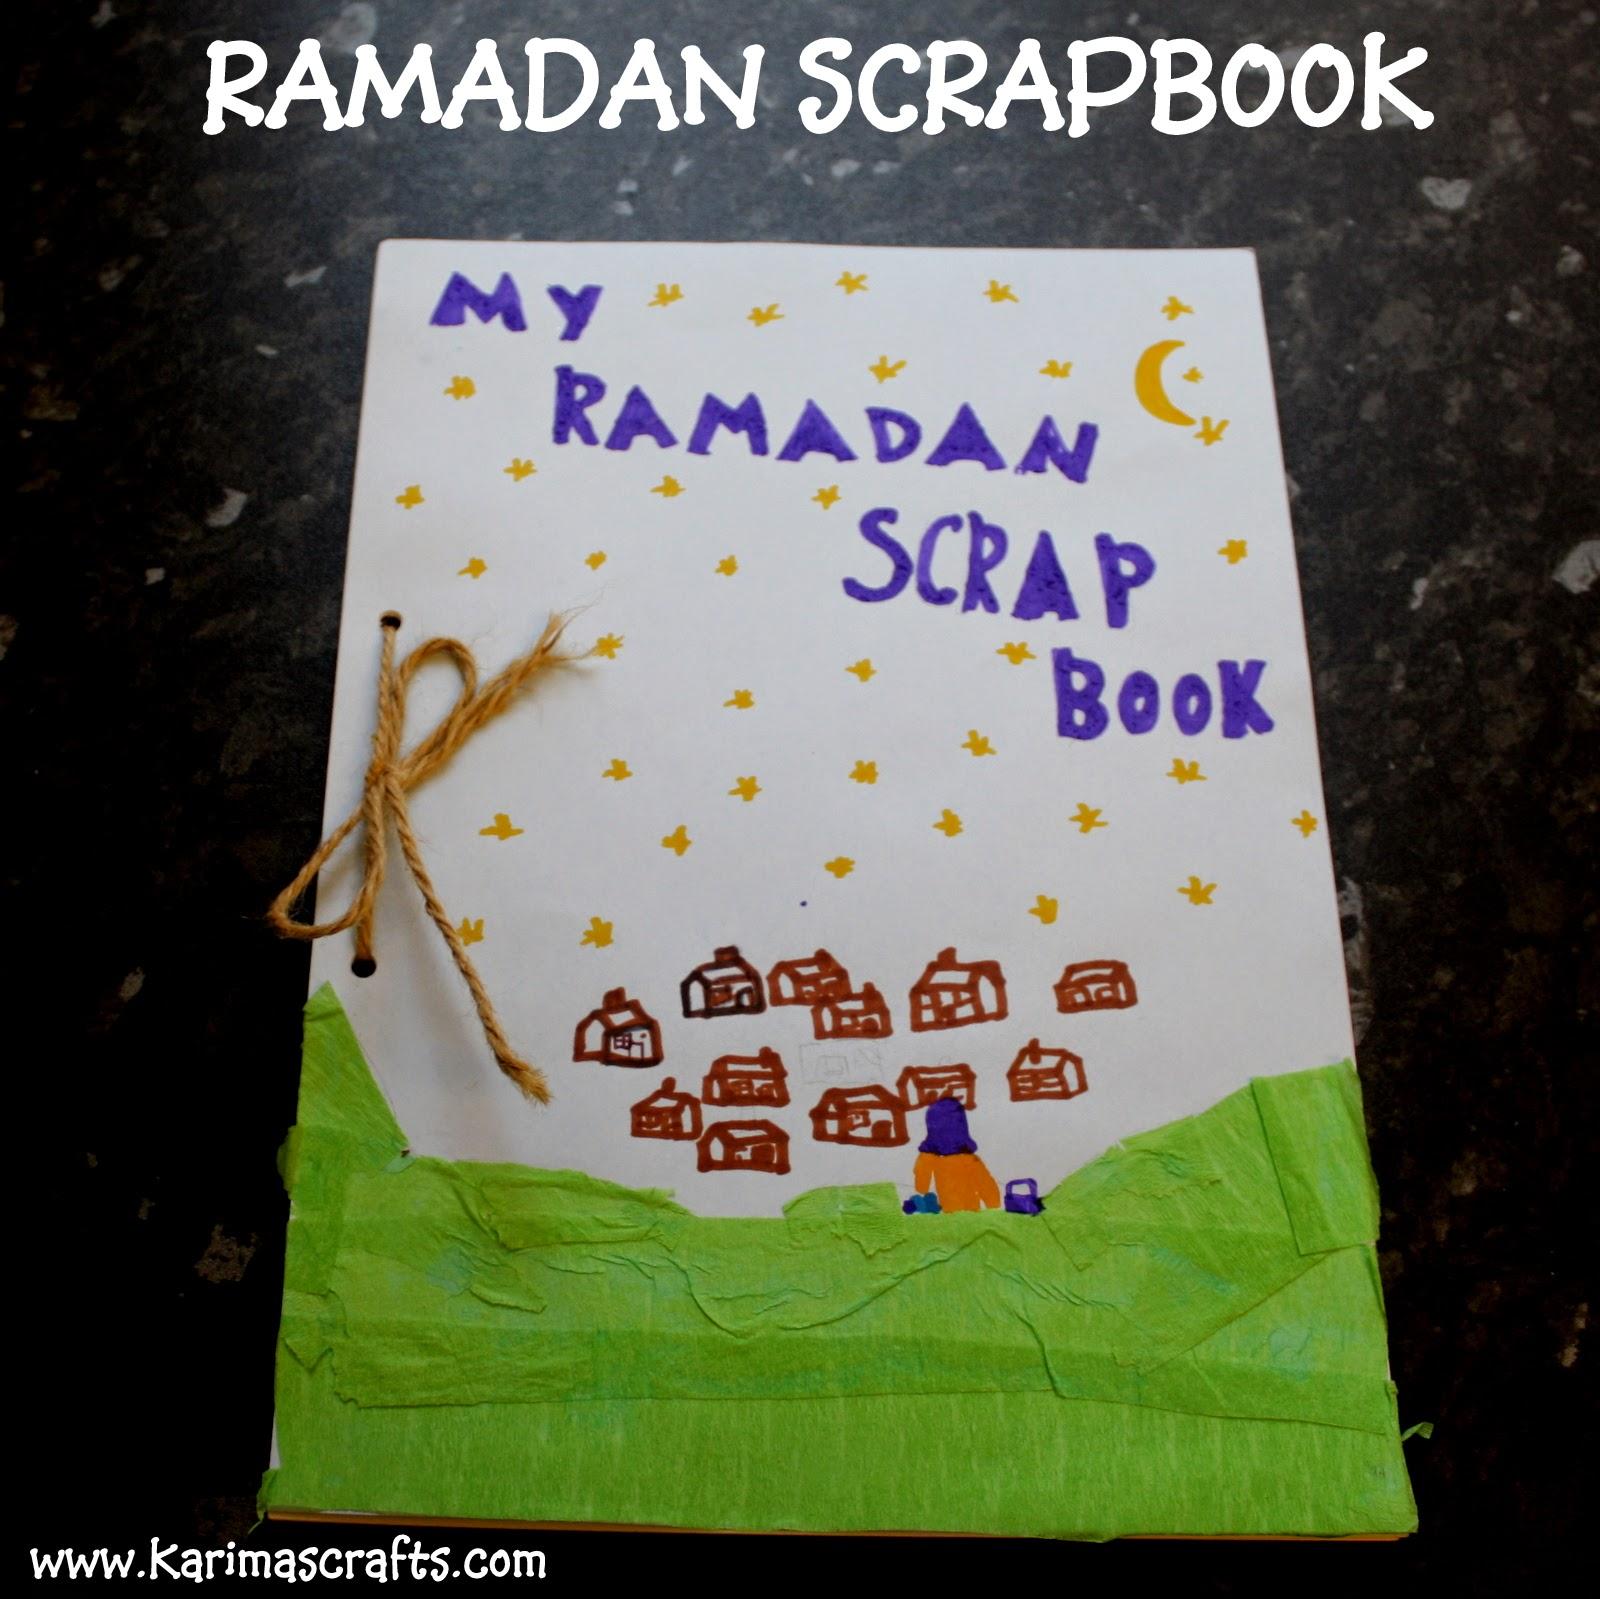 How to delete scrapbook photos google+ - Ramadan Scrapbook Tutorial